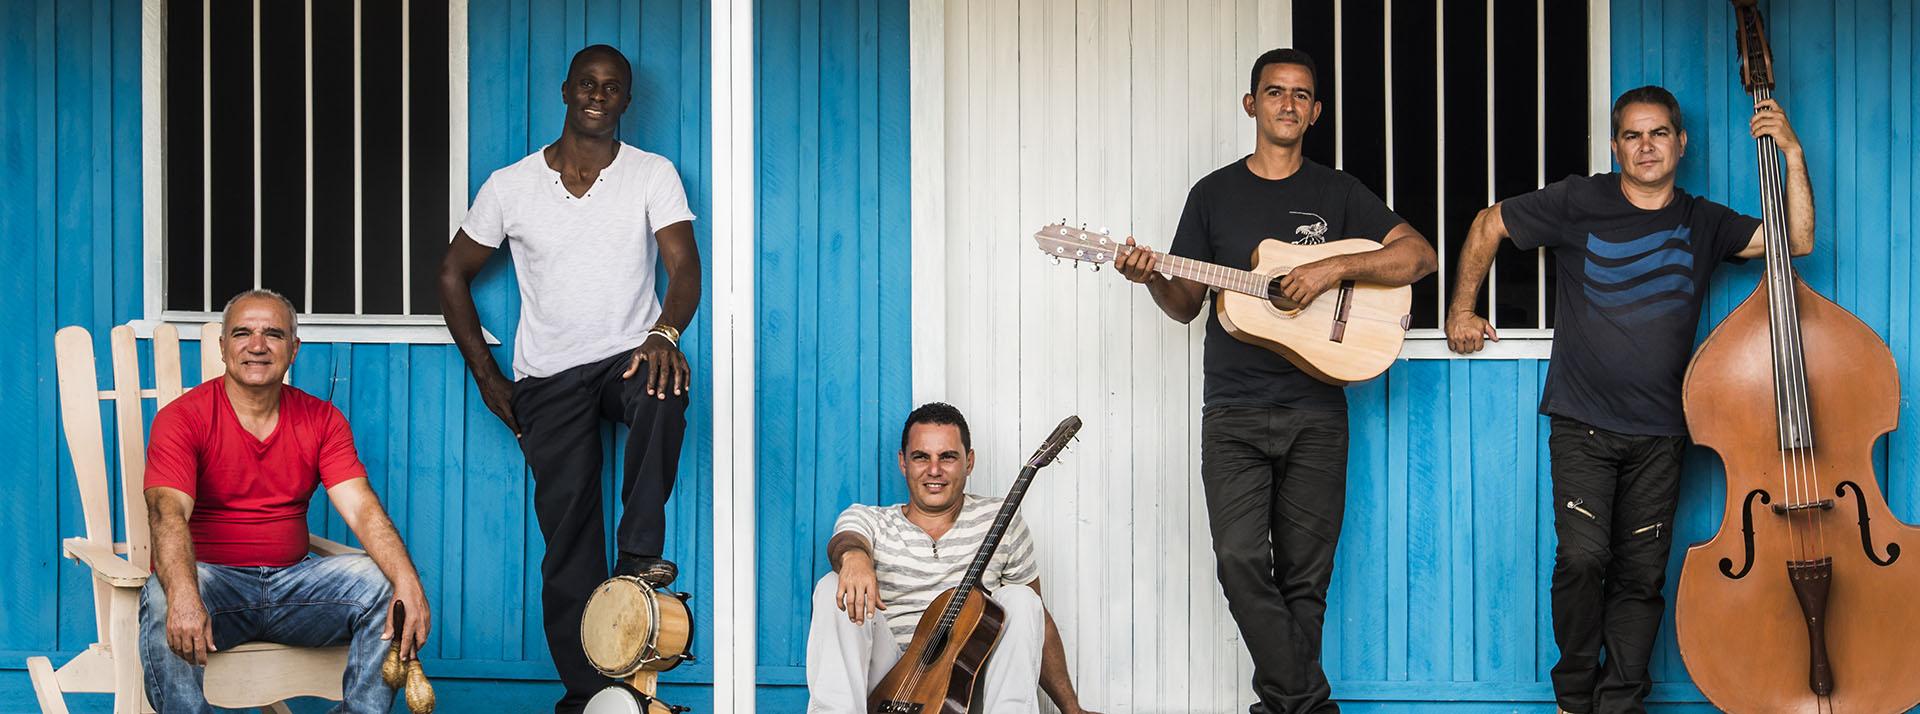 Die Band Guacachason